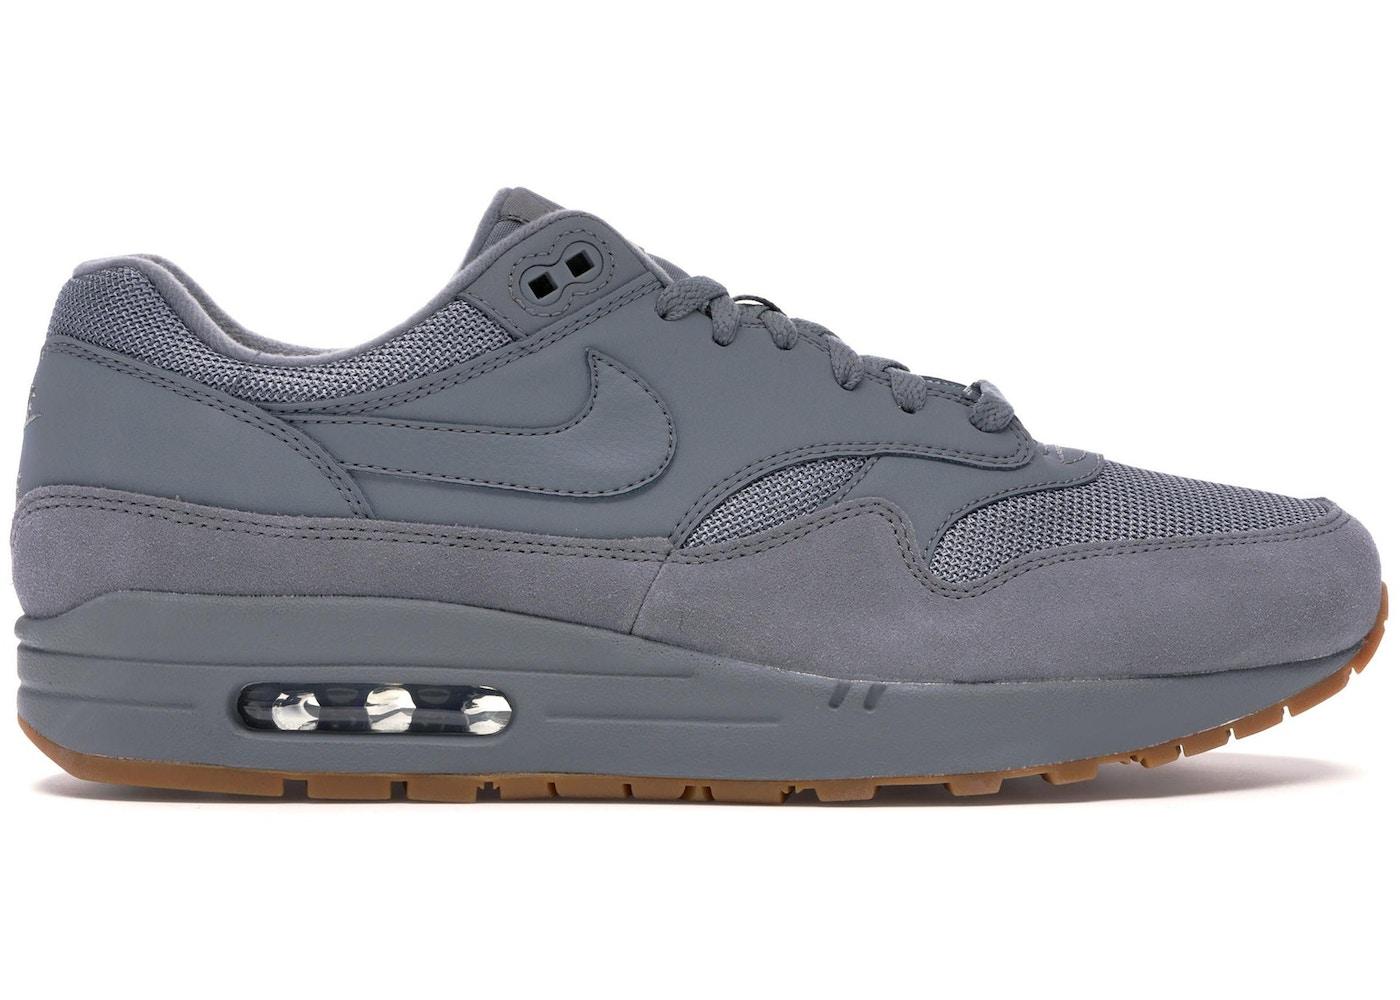 Encarnar Enumerar Cuna  Nike Air Max 1 Cool Grey Gum - AH8145-005